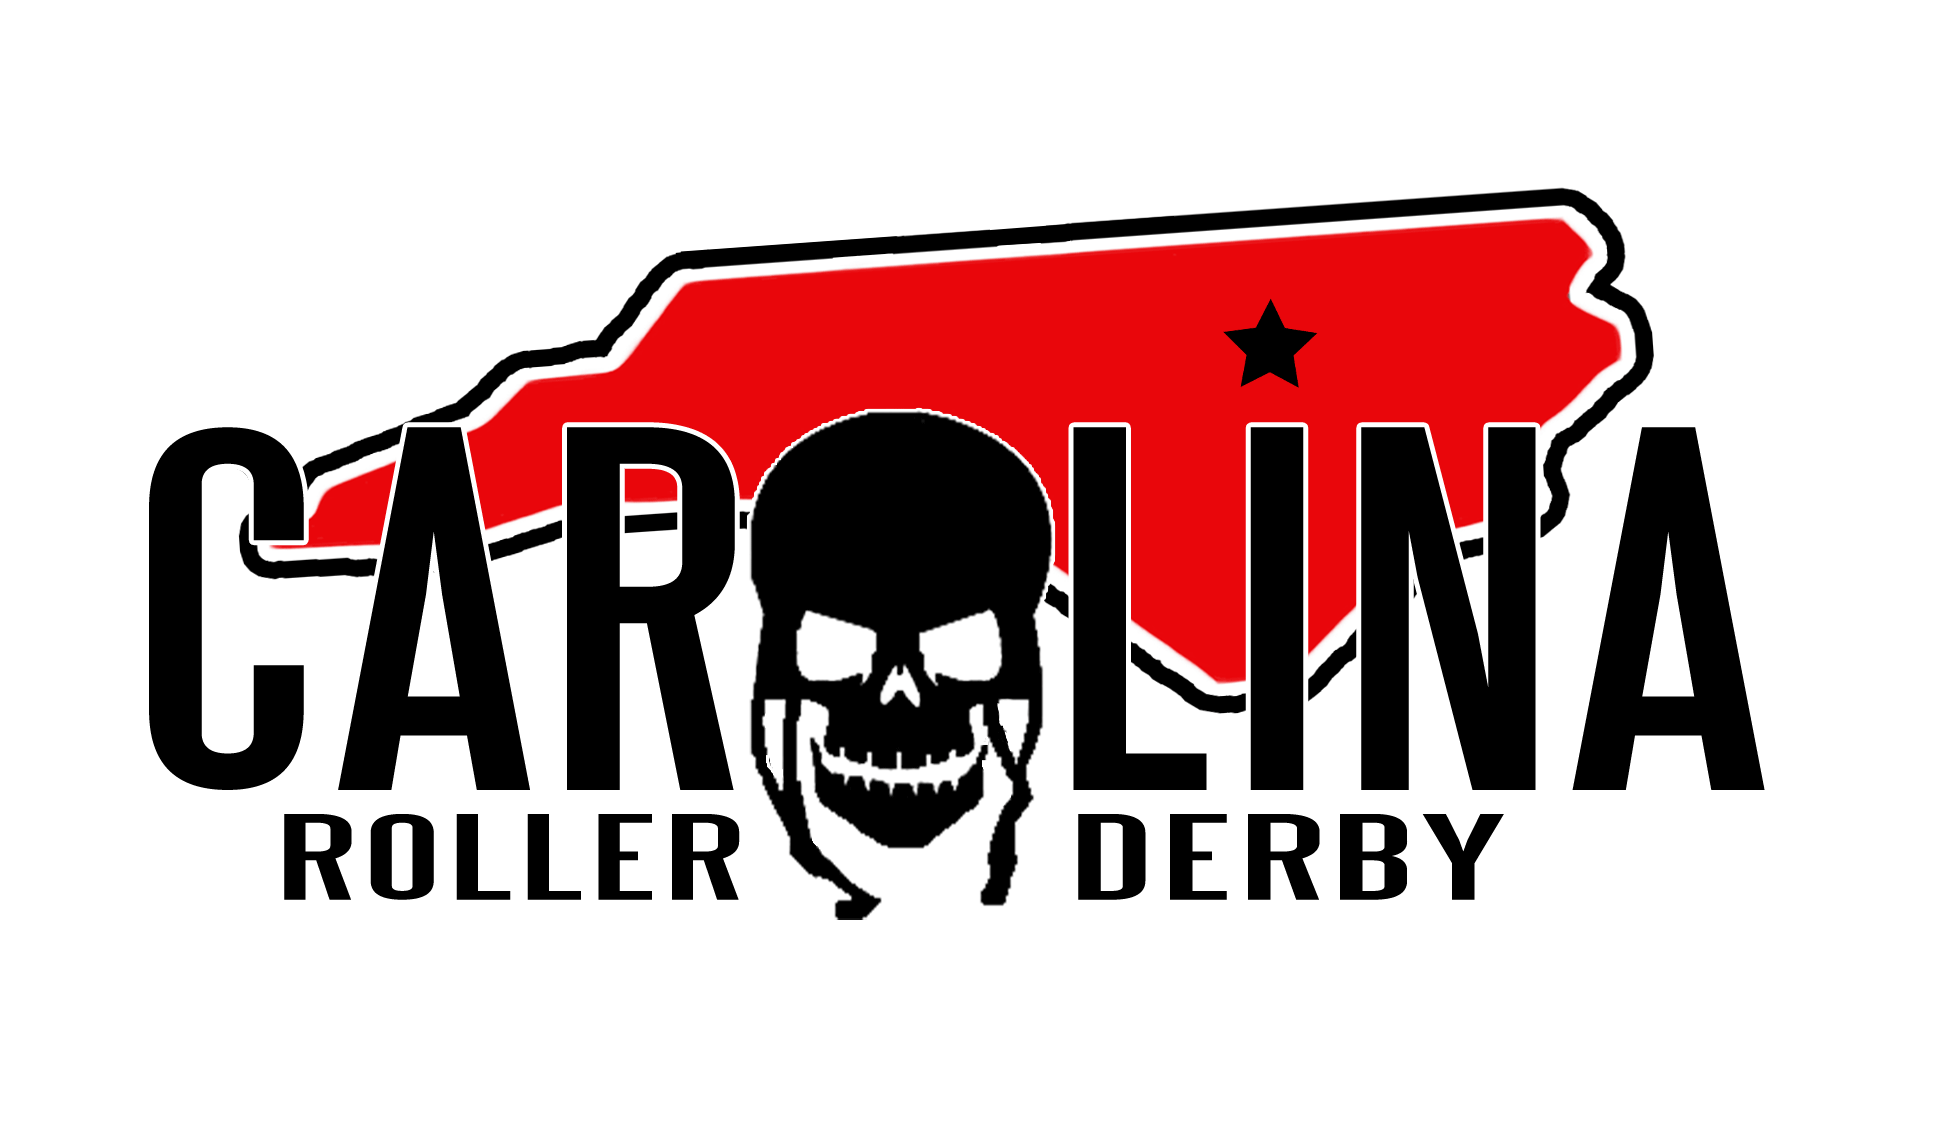 Carolina Roller Derby